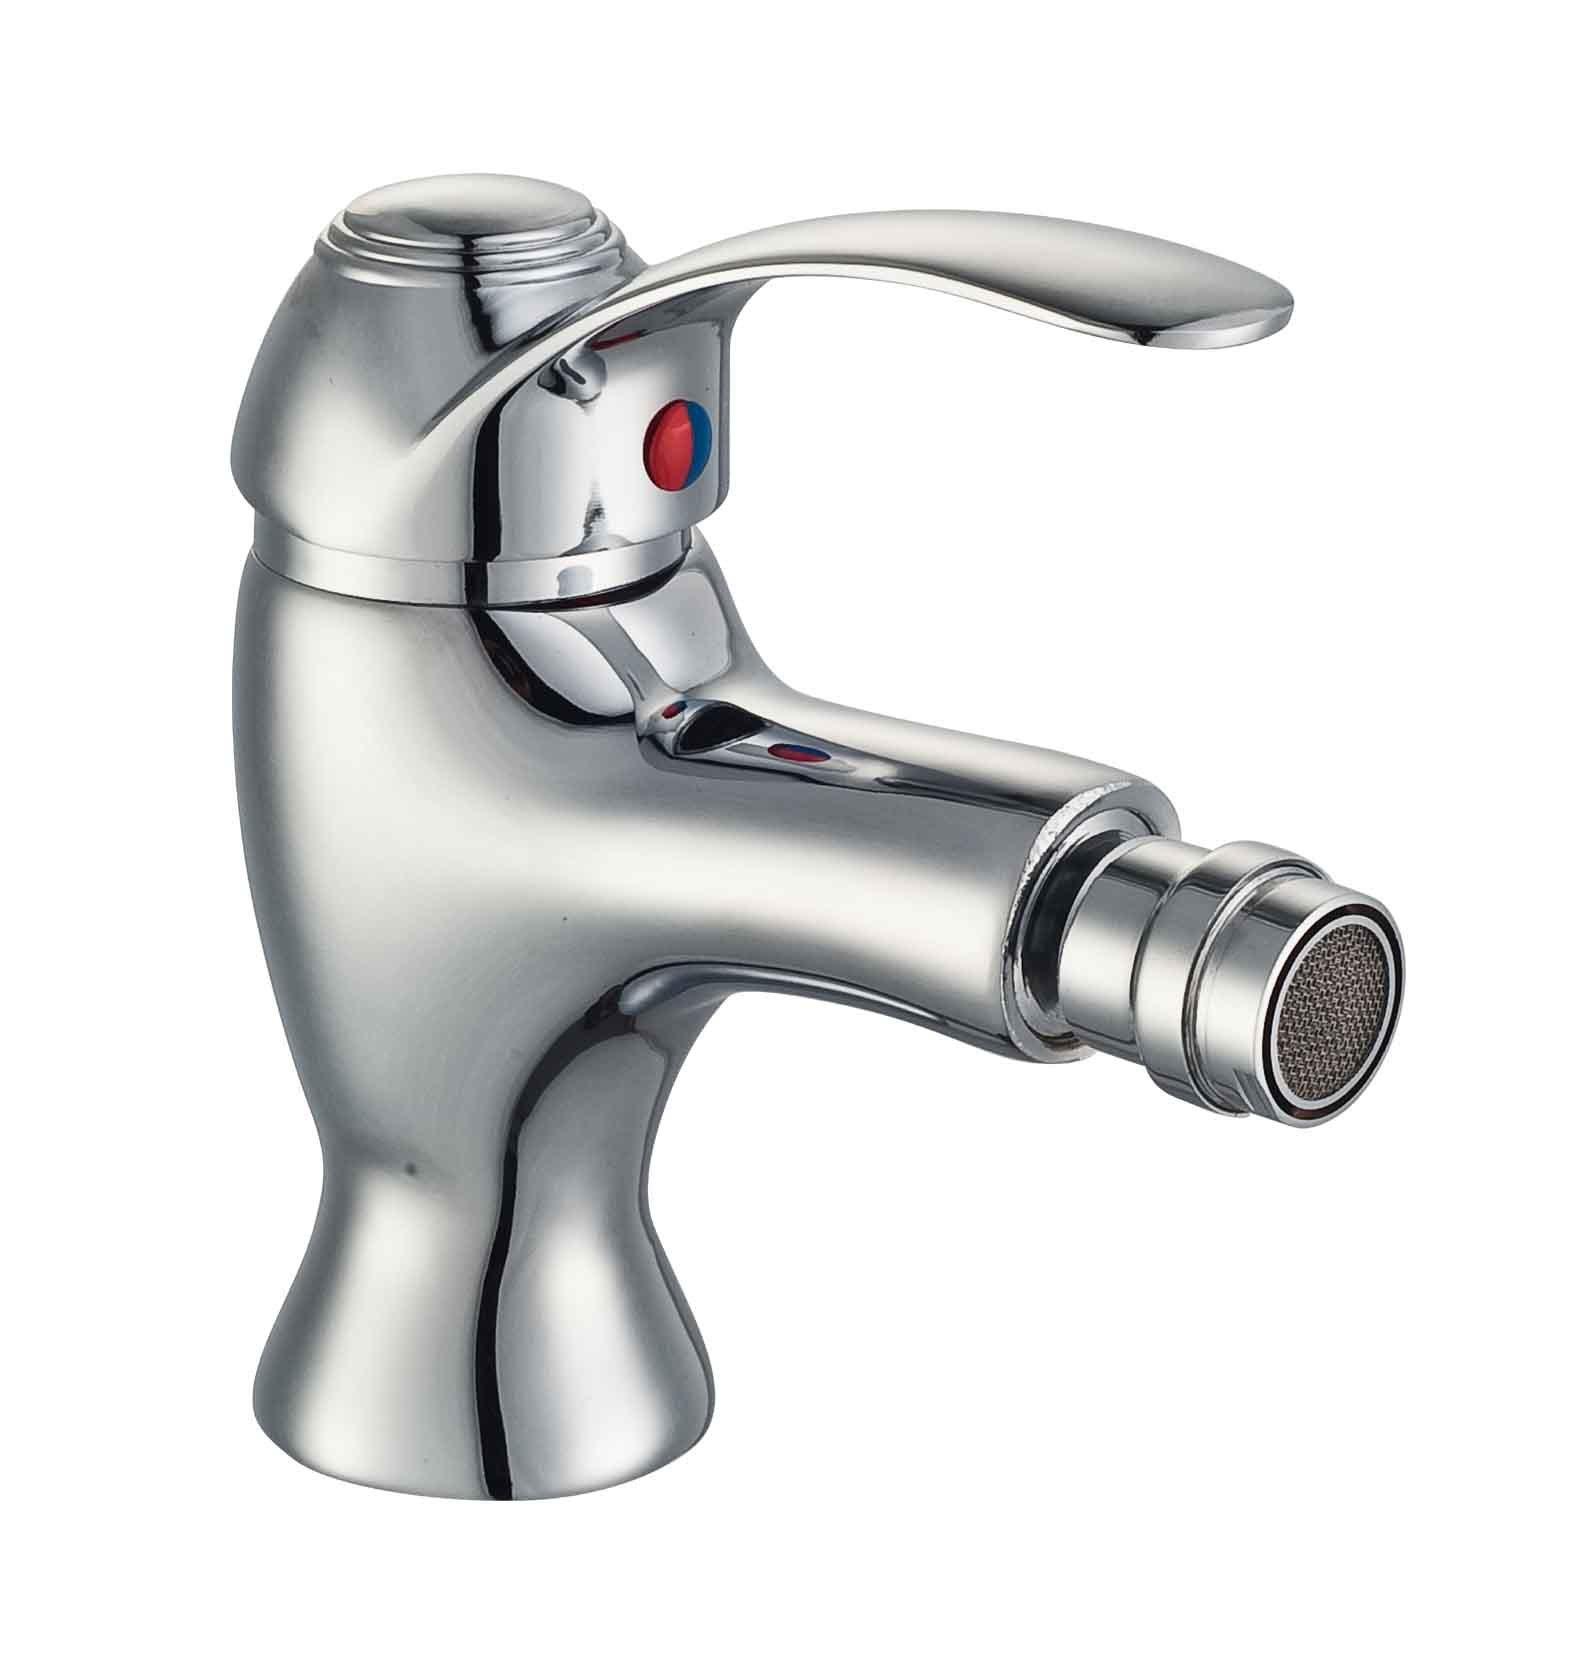 Bidet Faucet Mrs-1407 (MRS-1407) - China Bidet Faucet, Bidet Mixer